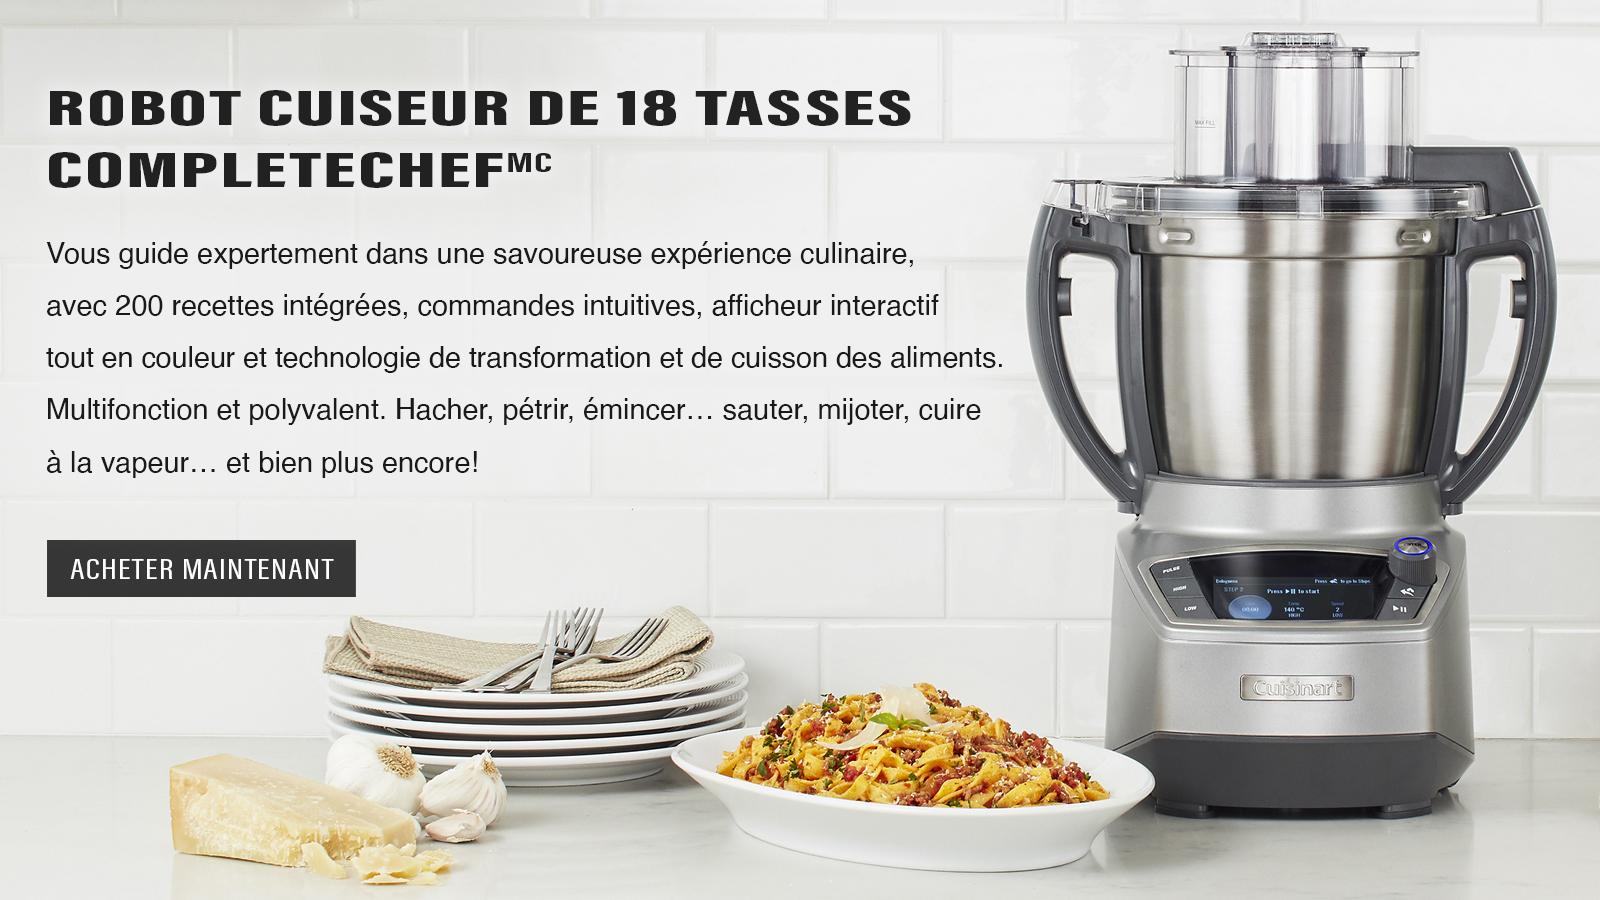 CompleteChef™ robot cuiseur